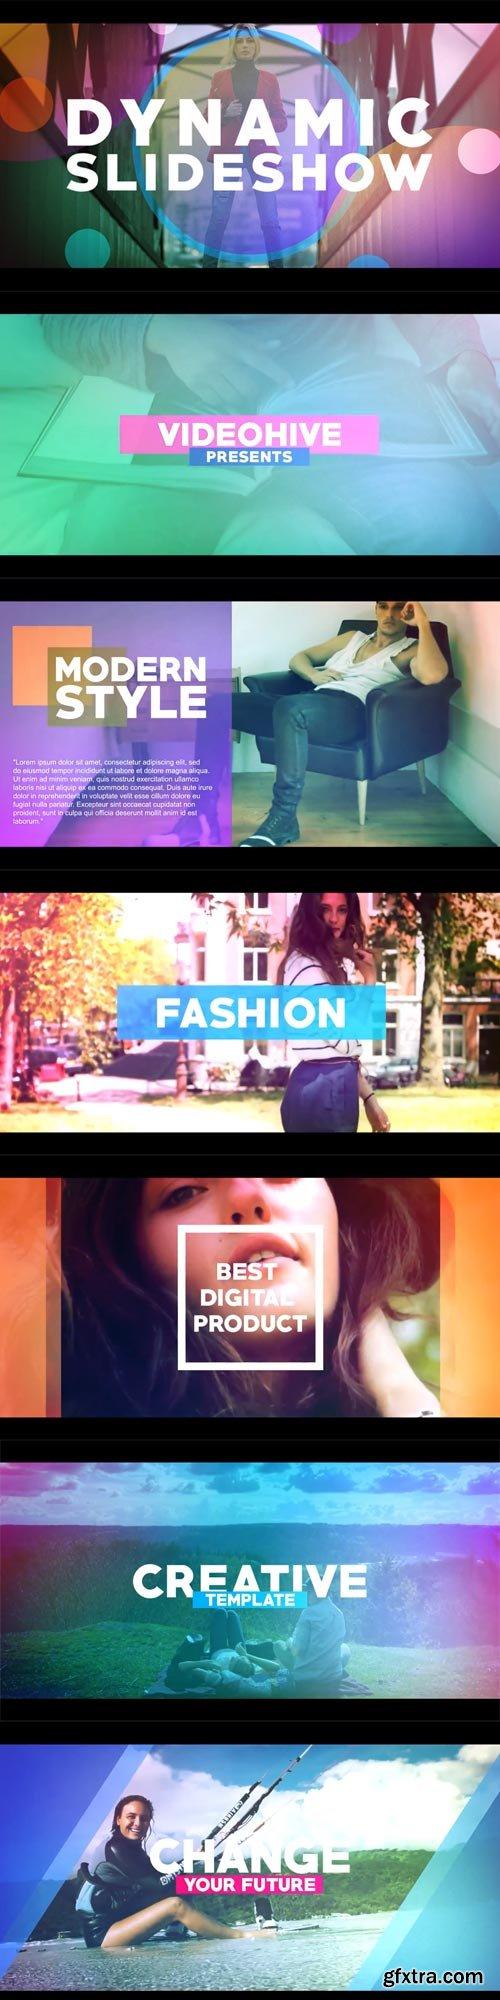 Videohive - Dynamic Slideshow - 22123139